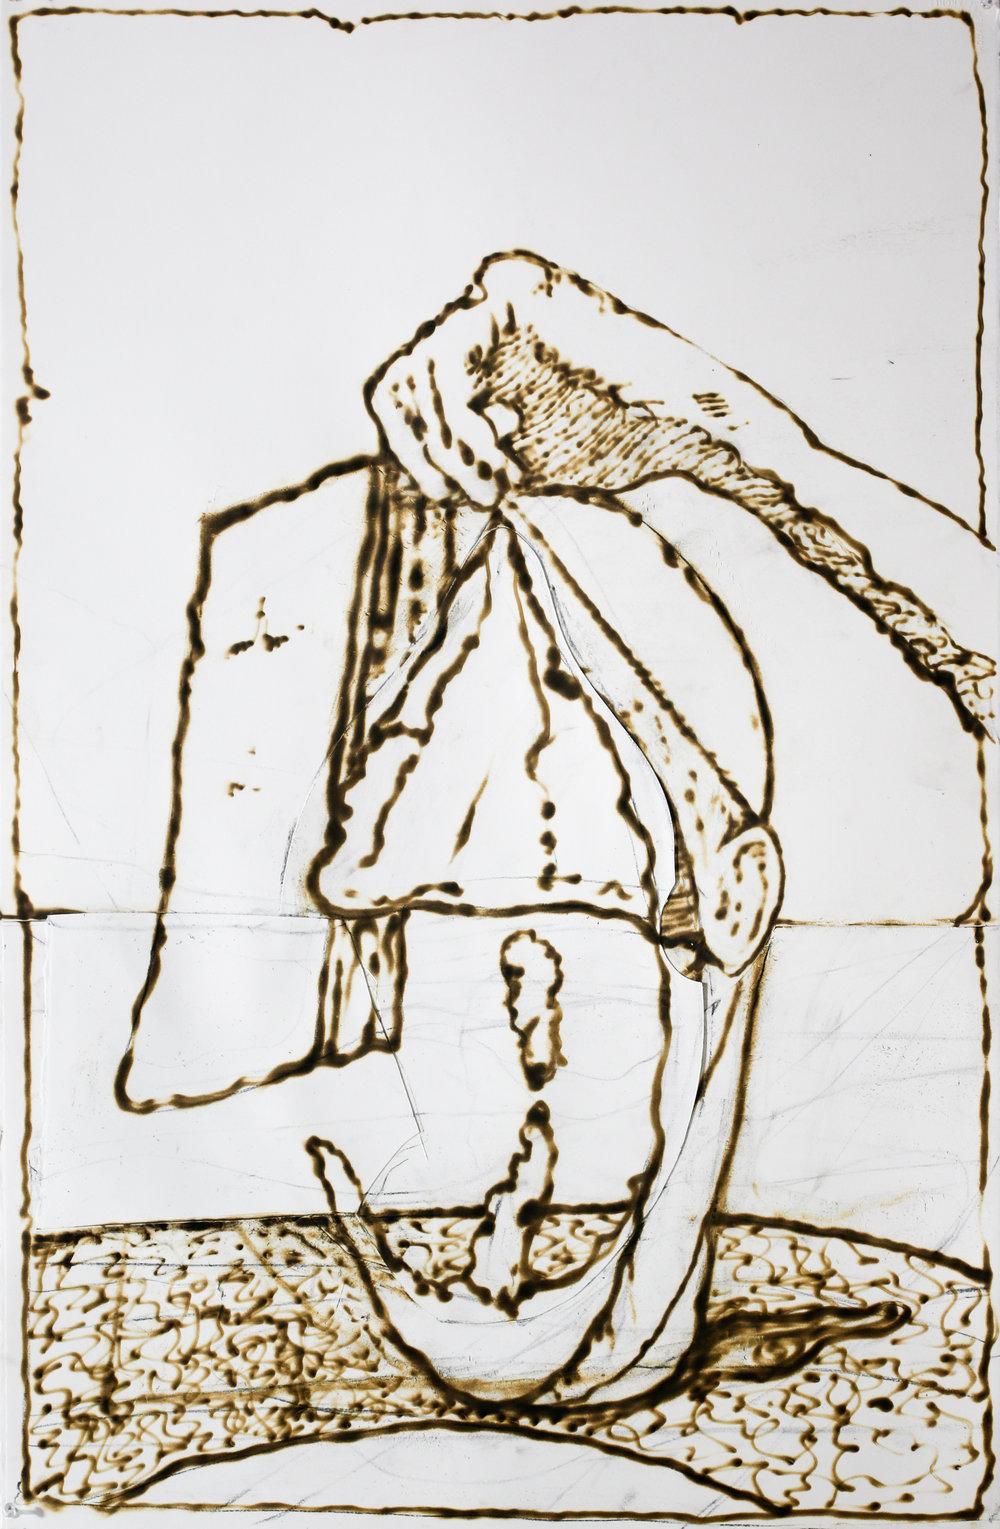 Flatland Drawings